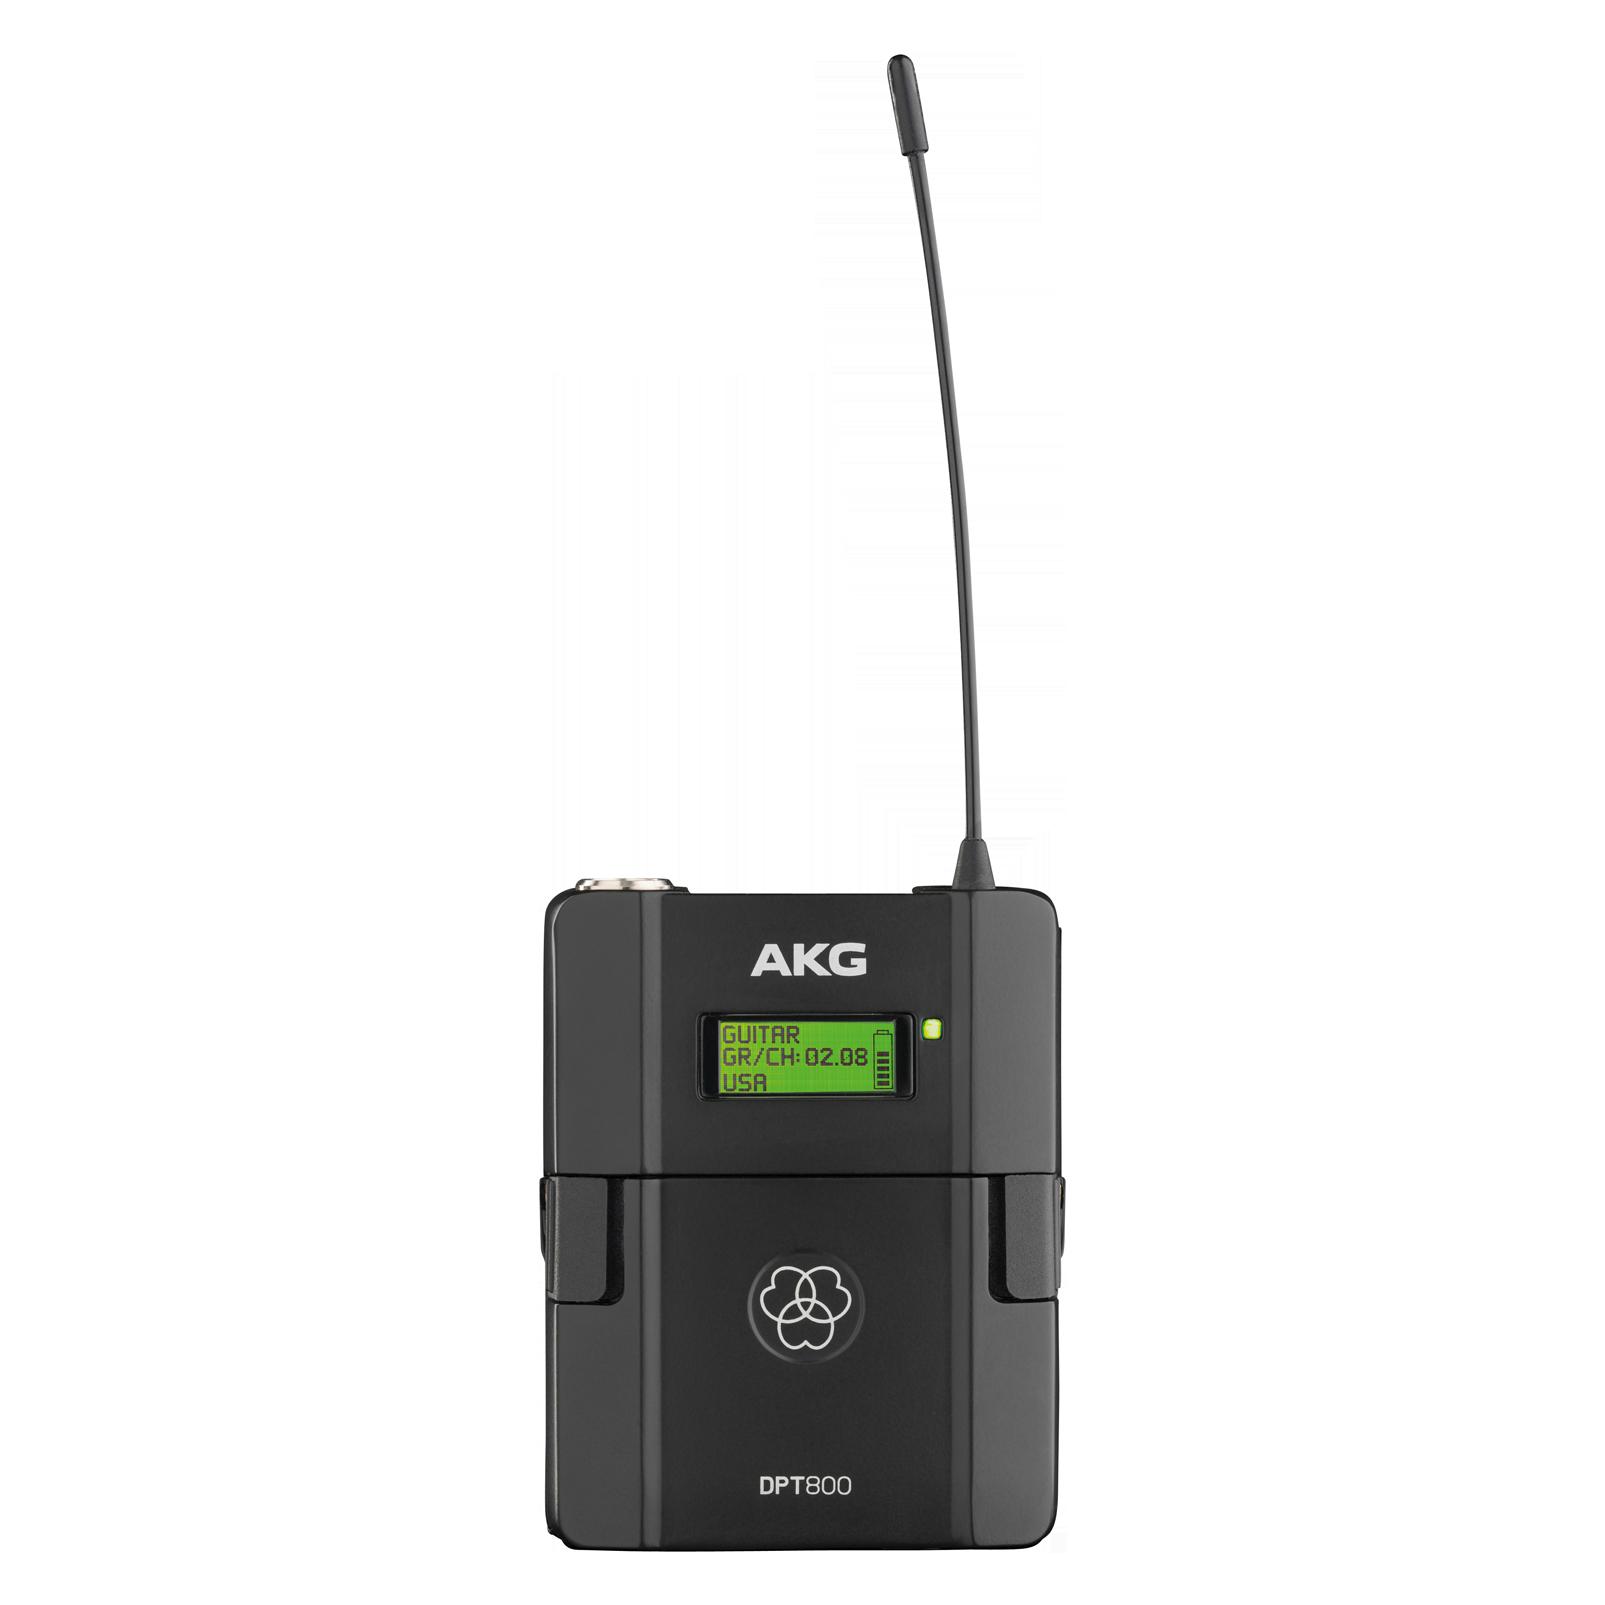 DPT800 Band1 50mW (B-Stock) - Black - Reference digital wireless body pack transmitter - Hero